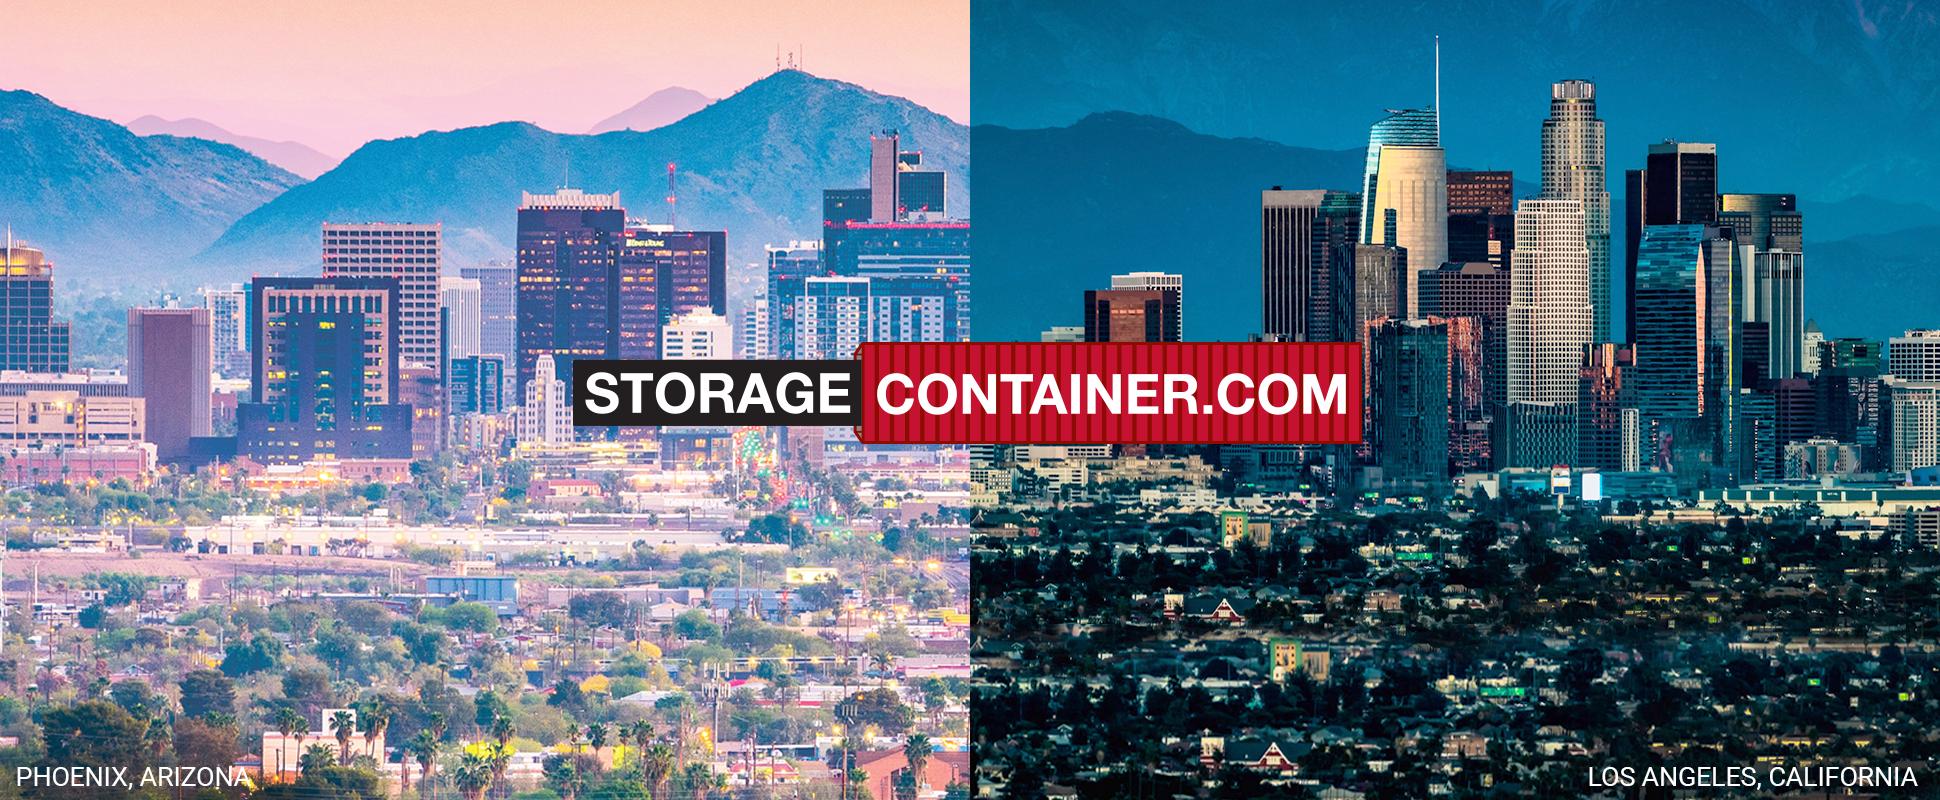 Storage Container.com Phoenix and Los Angeles